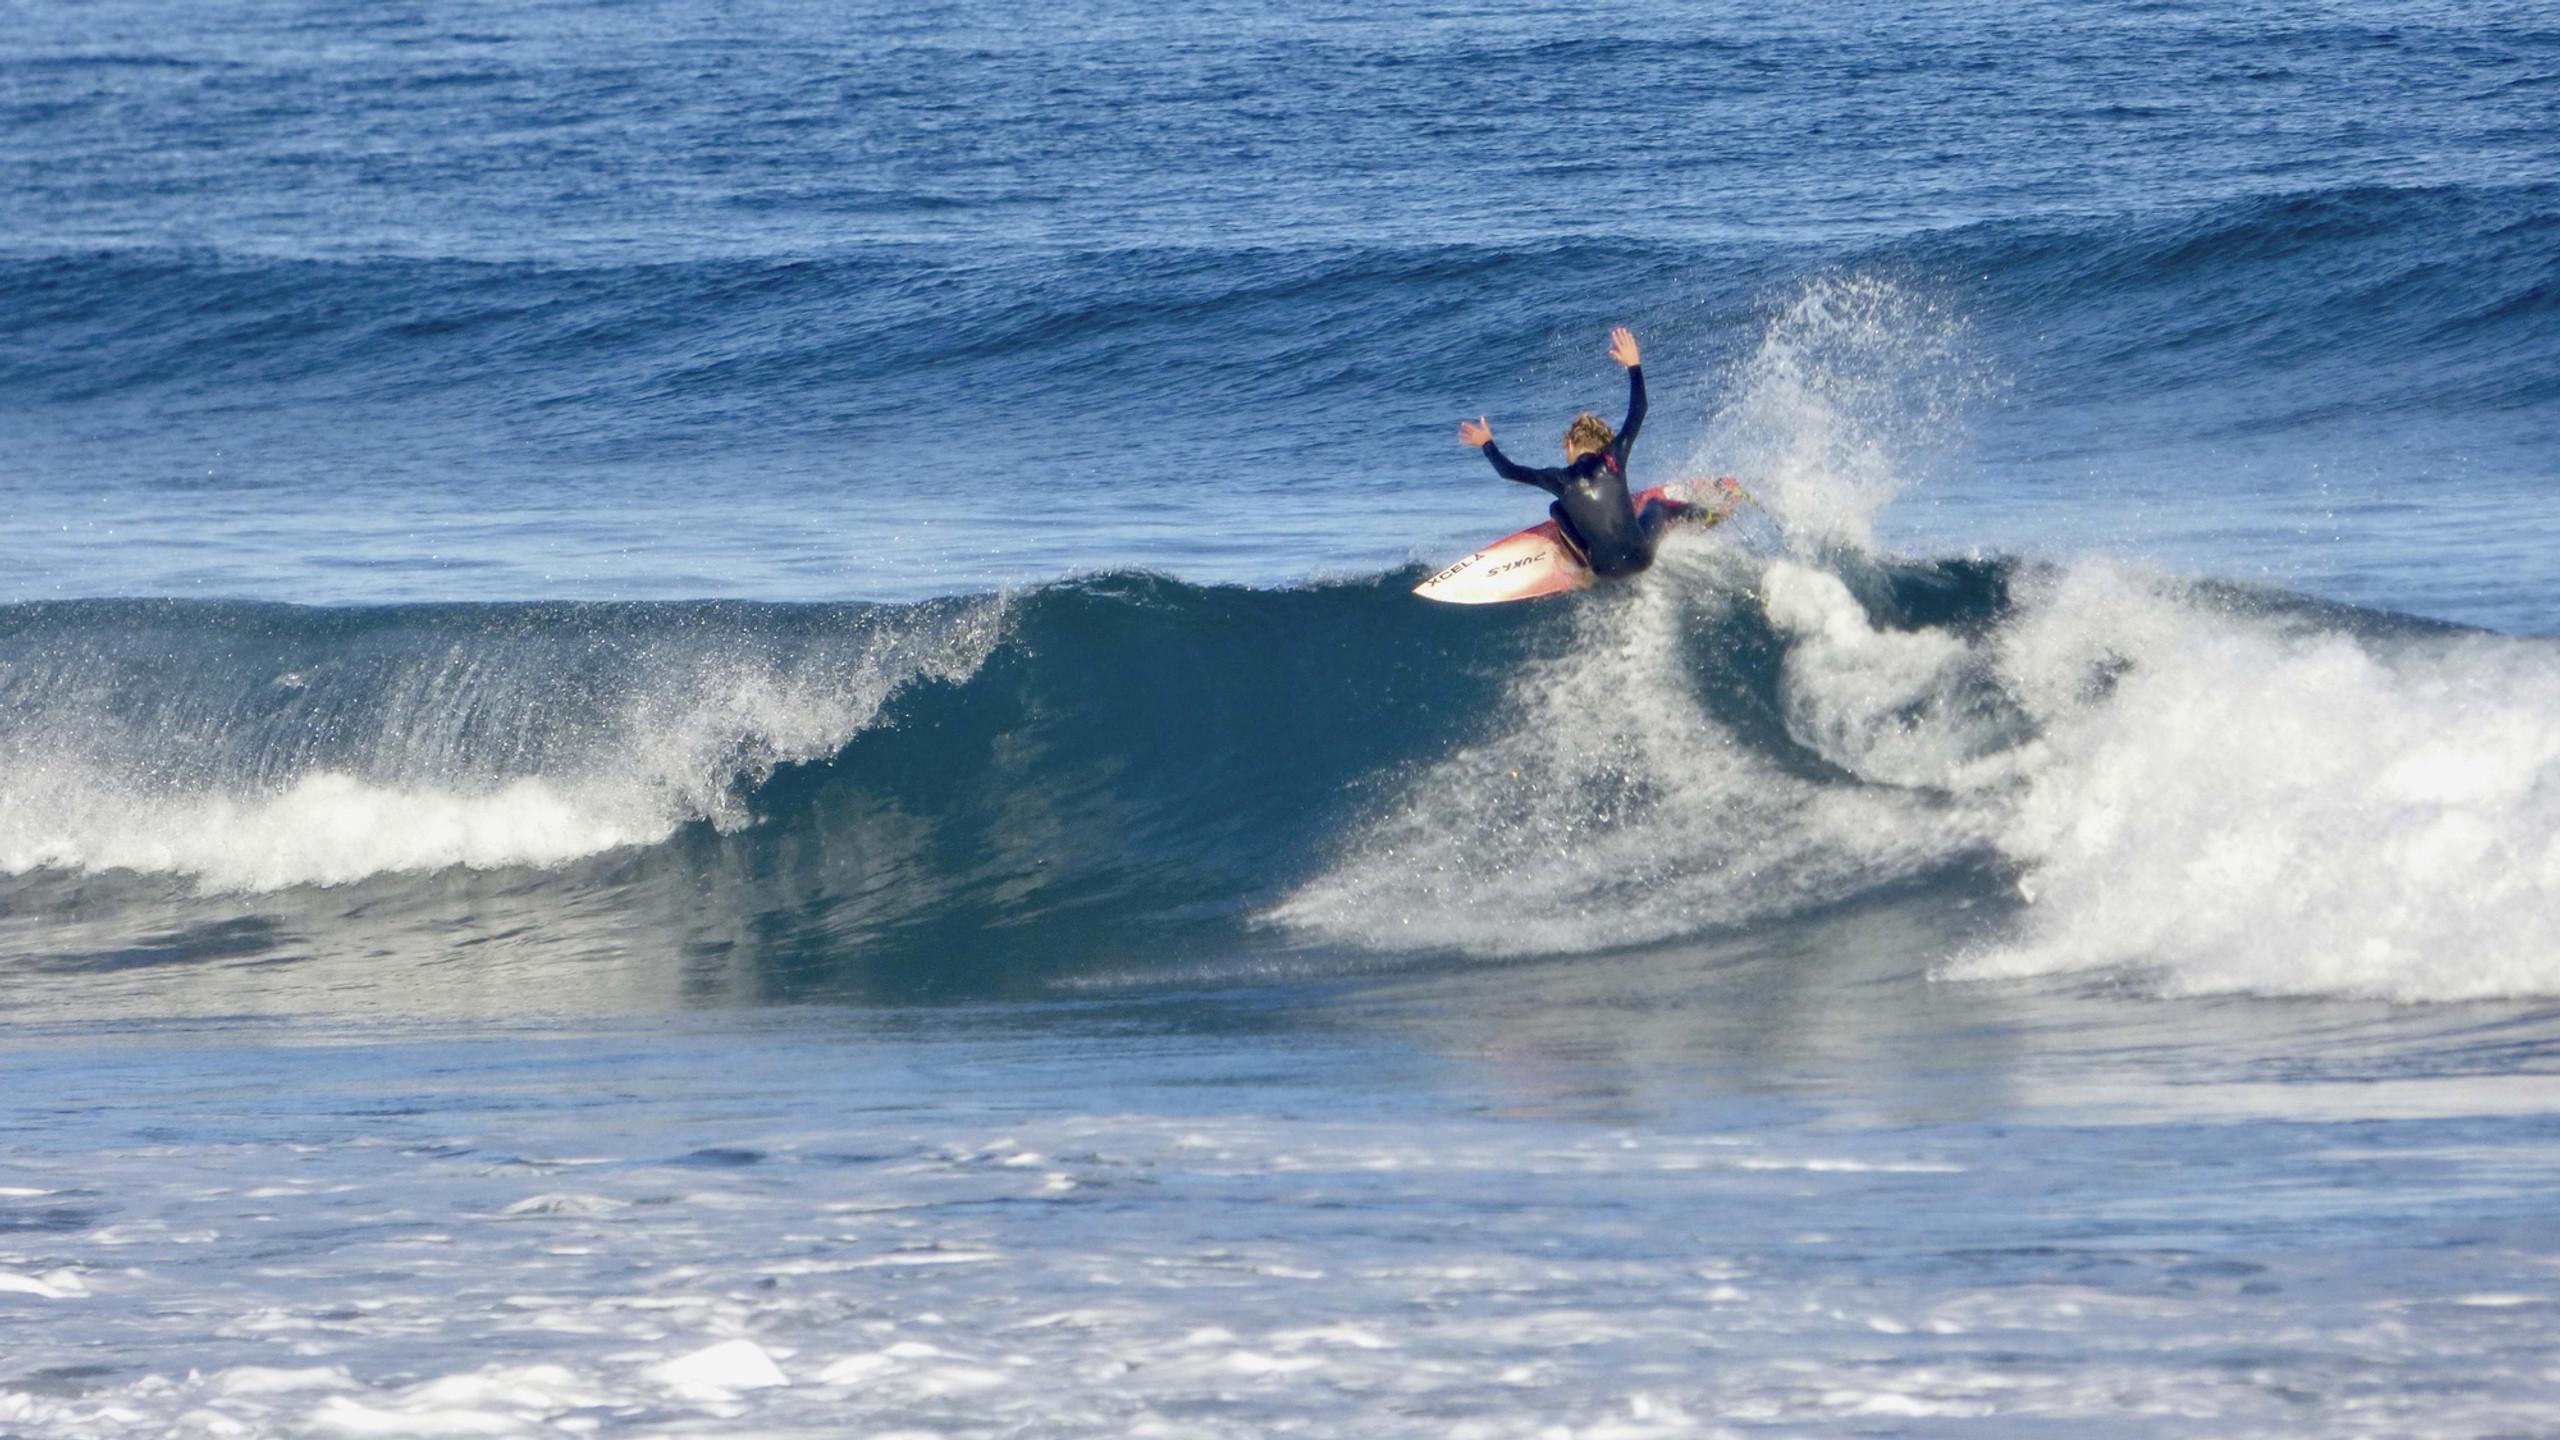 surf day Frejulfe beach